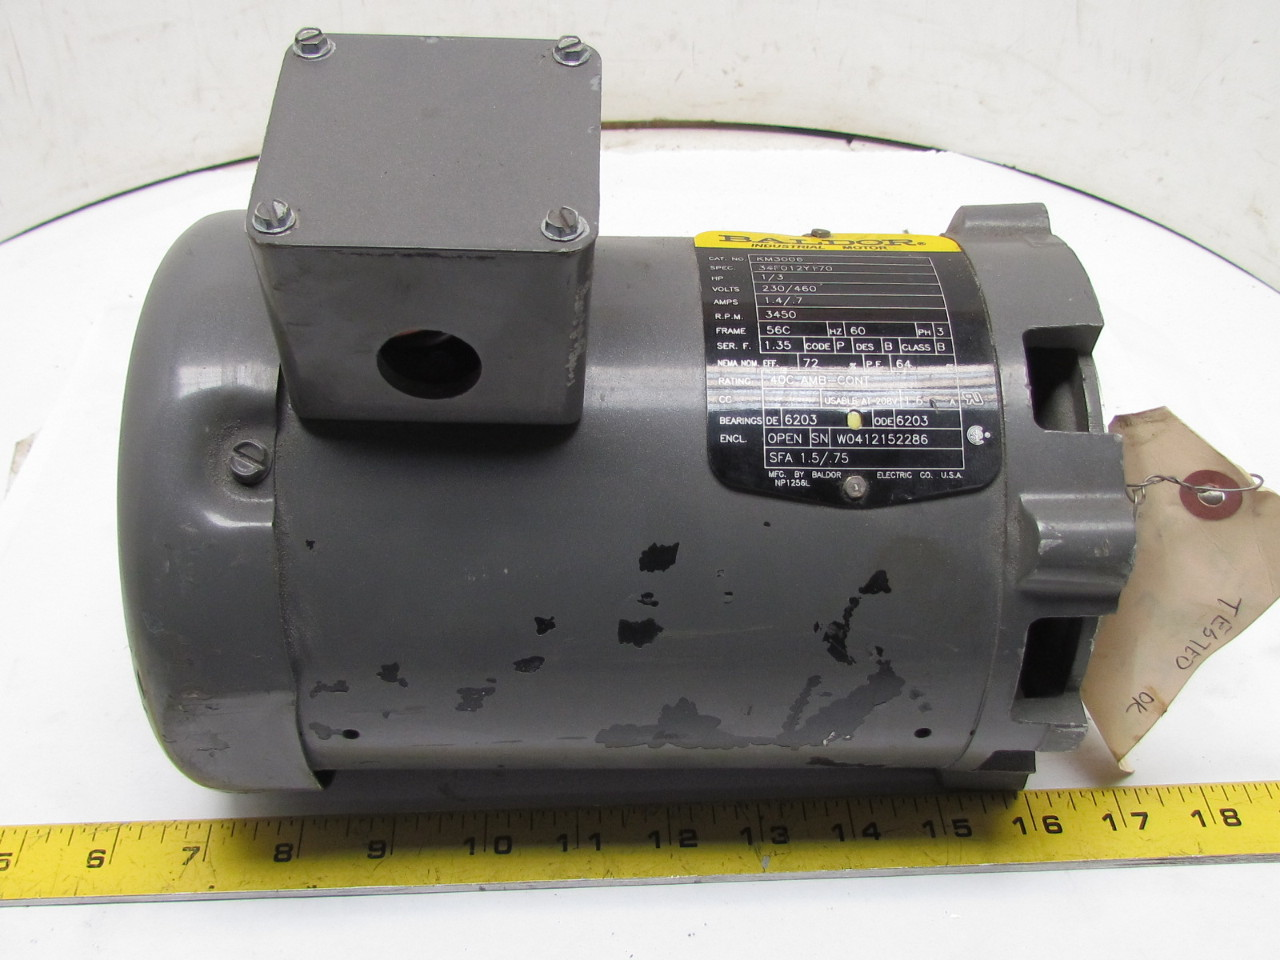 Baldor km3006 34f012y170 3ph ac electric motor 1 3hp 3450 for 56c frame motor dimensions